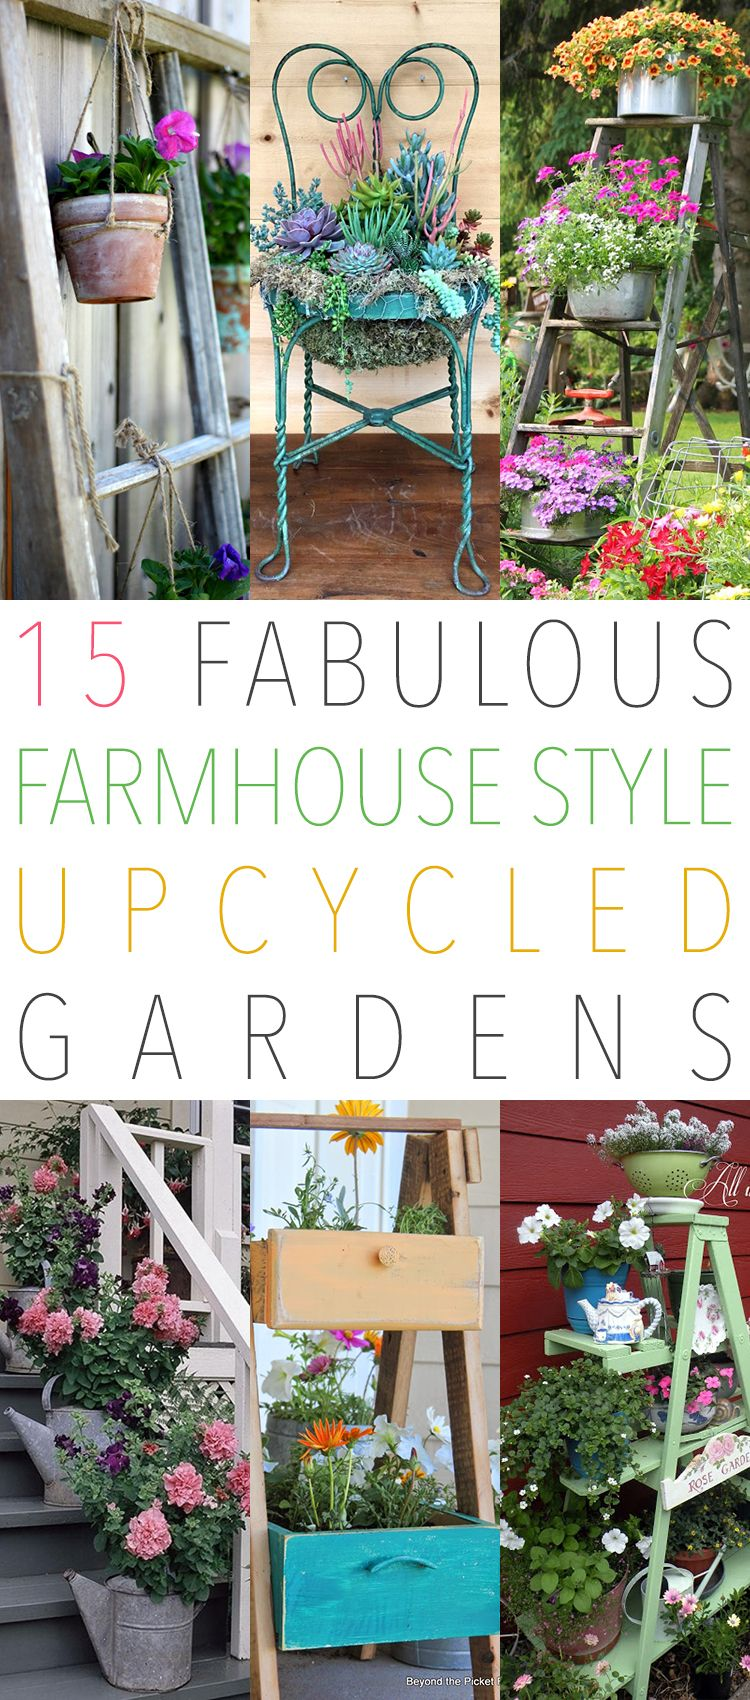 15 fabulous farmhouse style upcycled gardens the cottage market